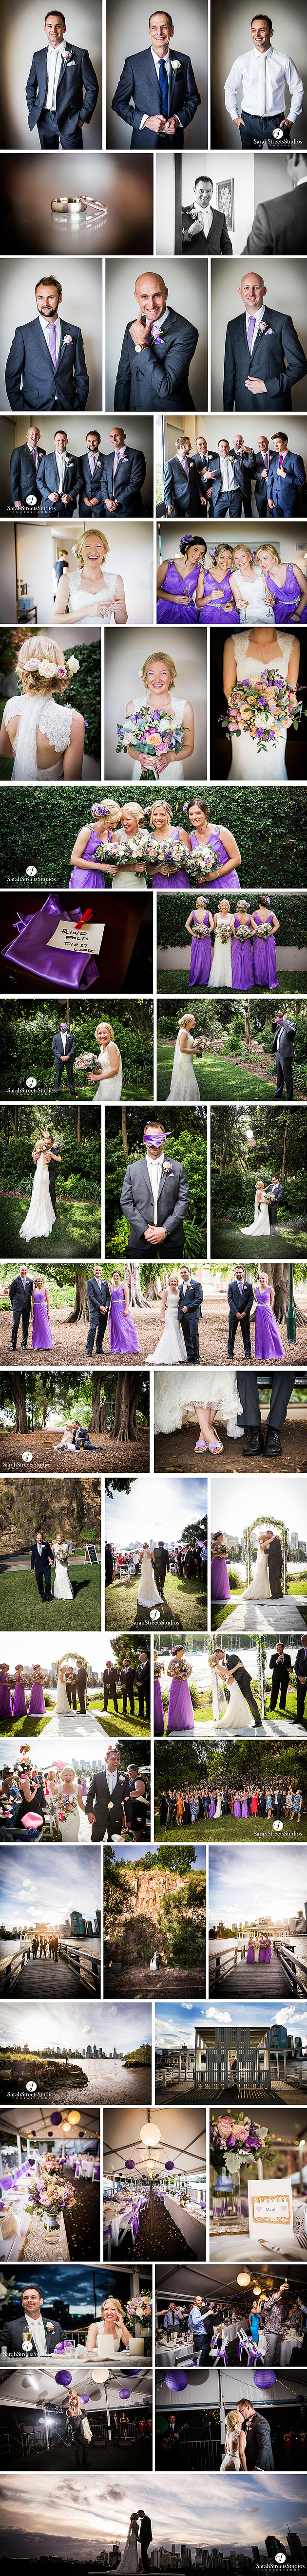 brisbane wedding photographers, brisbane wedding photographer, candid wedding photography brisbane